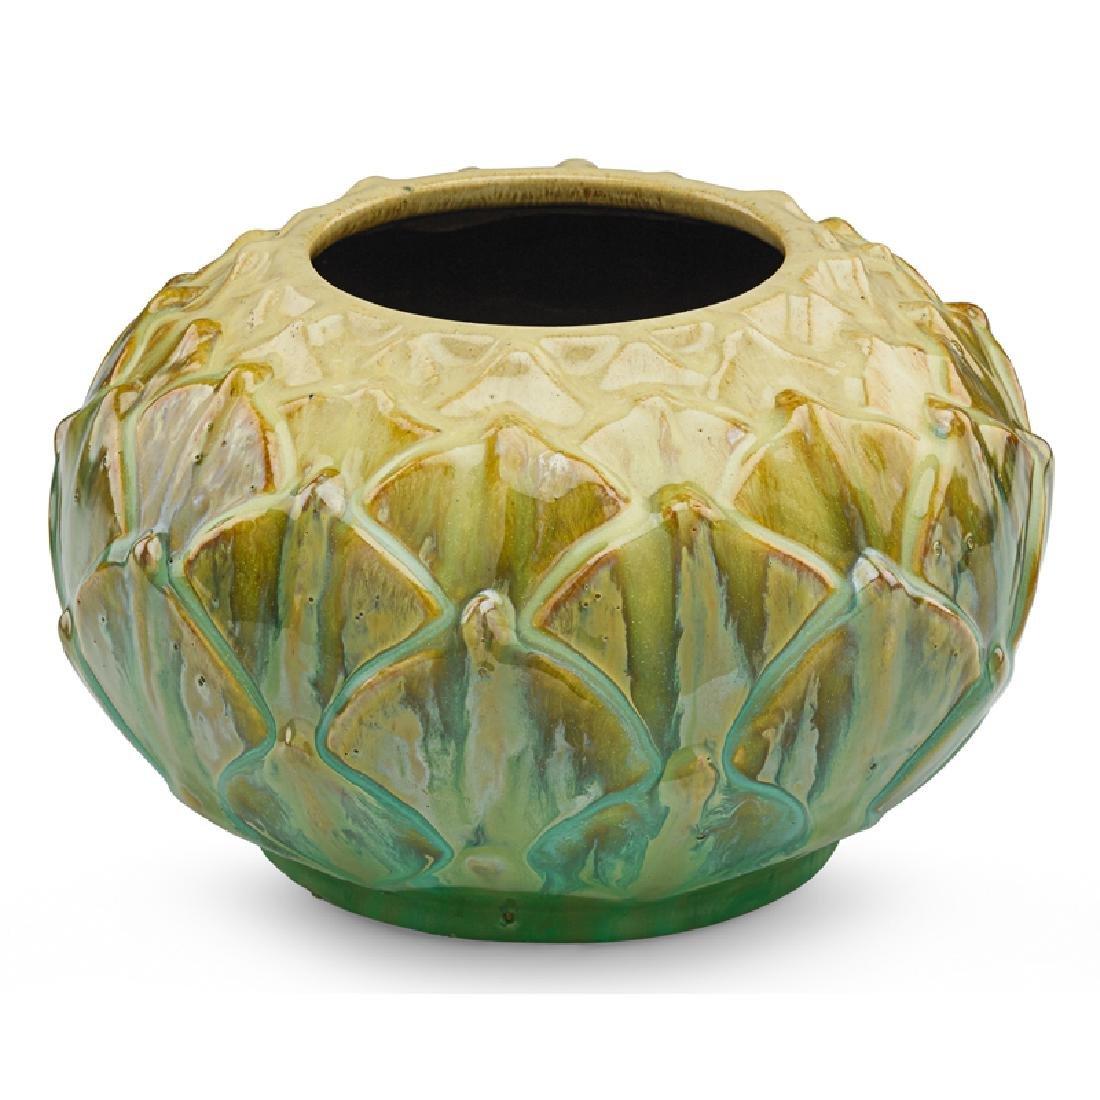 FULPER Artichoke vase - 3